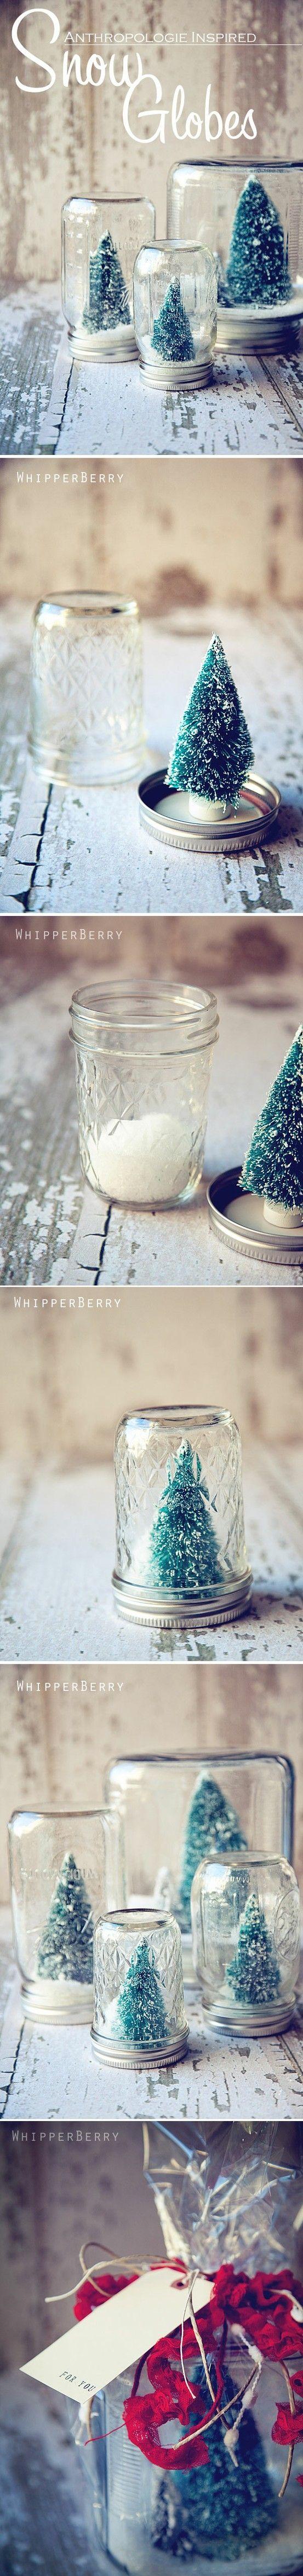 Snow Globes Tutorial :D